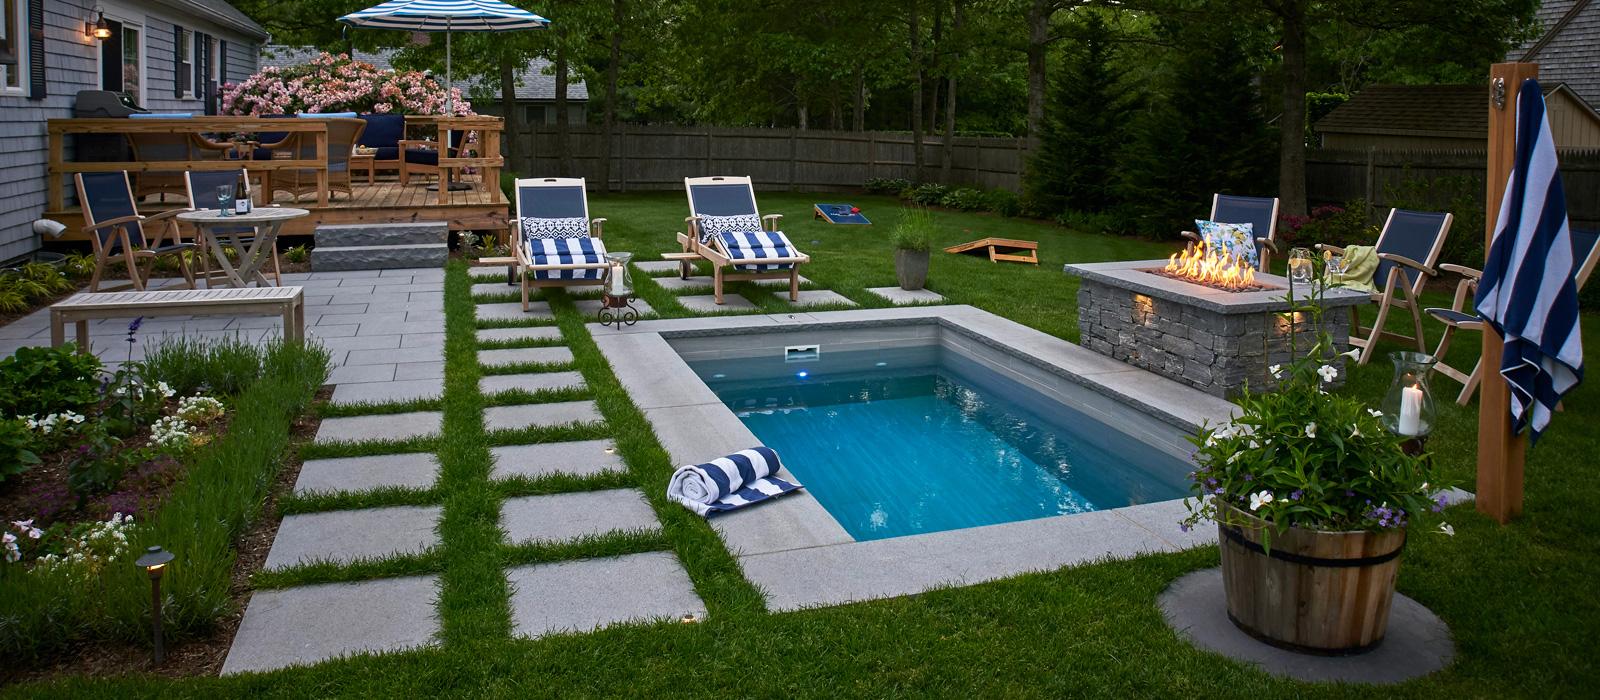 Soake Pools - Photo of plunge pool installed